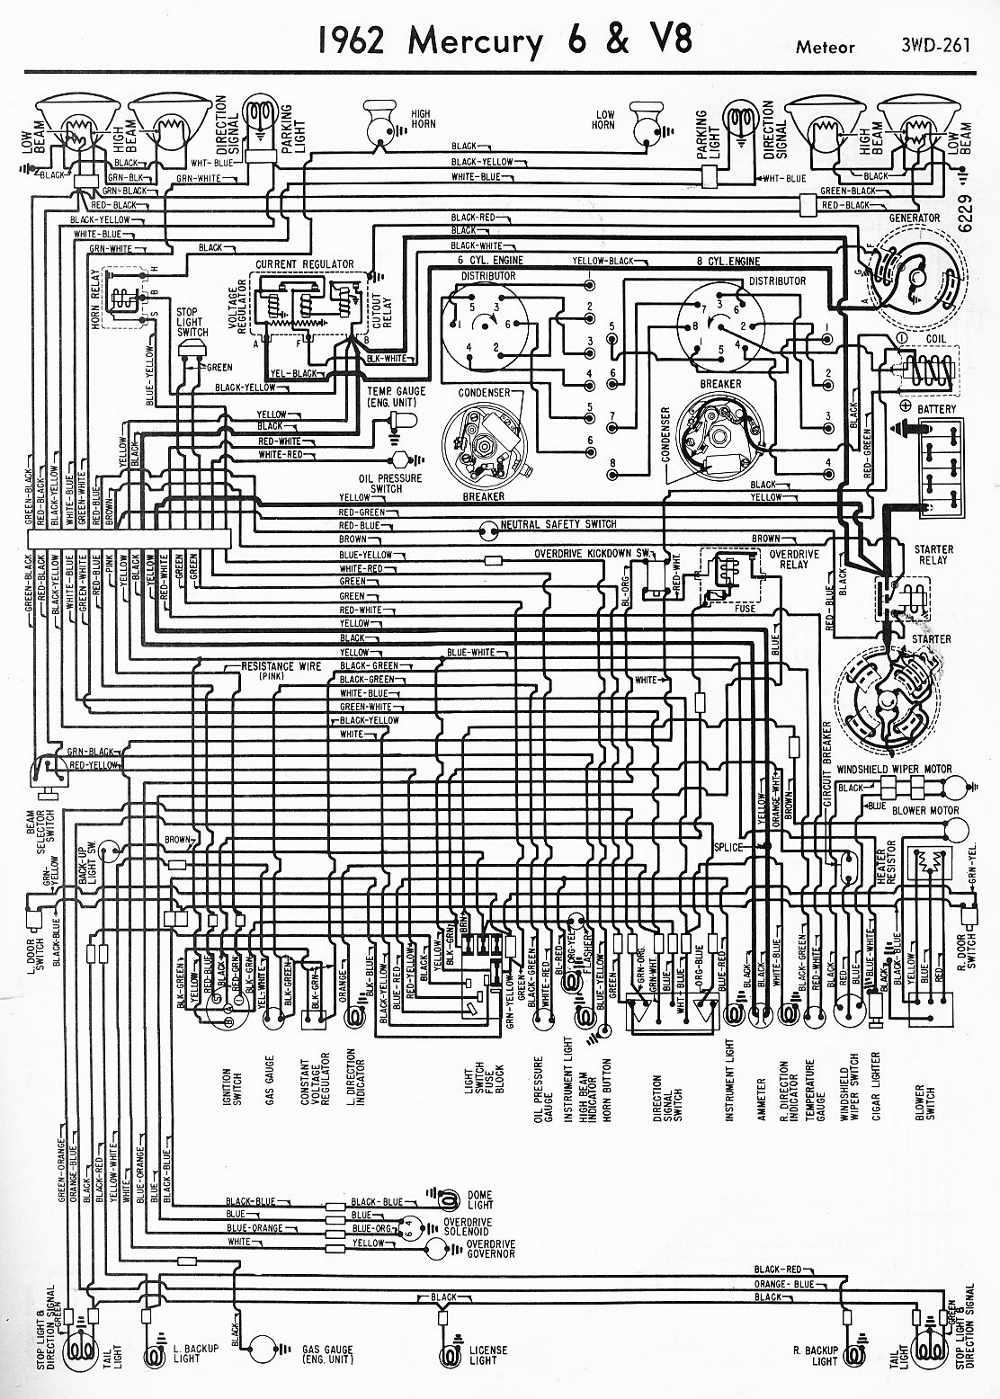 medium resolution of 1969 mercury cyclone wiring diagram wiring diagram1969 mercury cyclone wiring diagram best part of wiring diagram1971